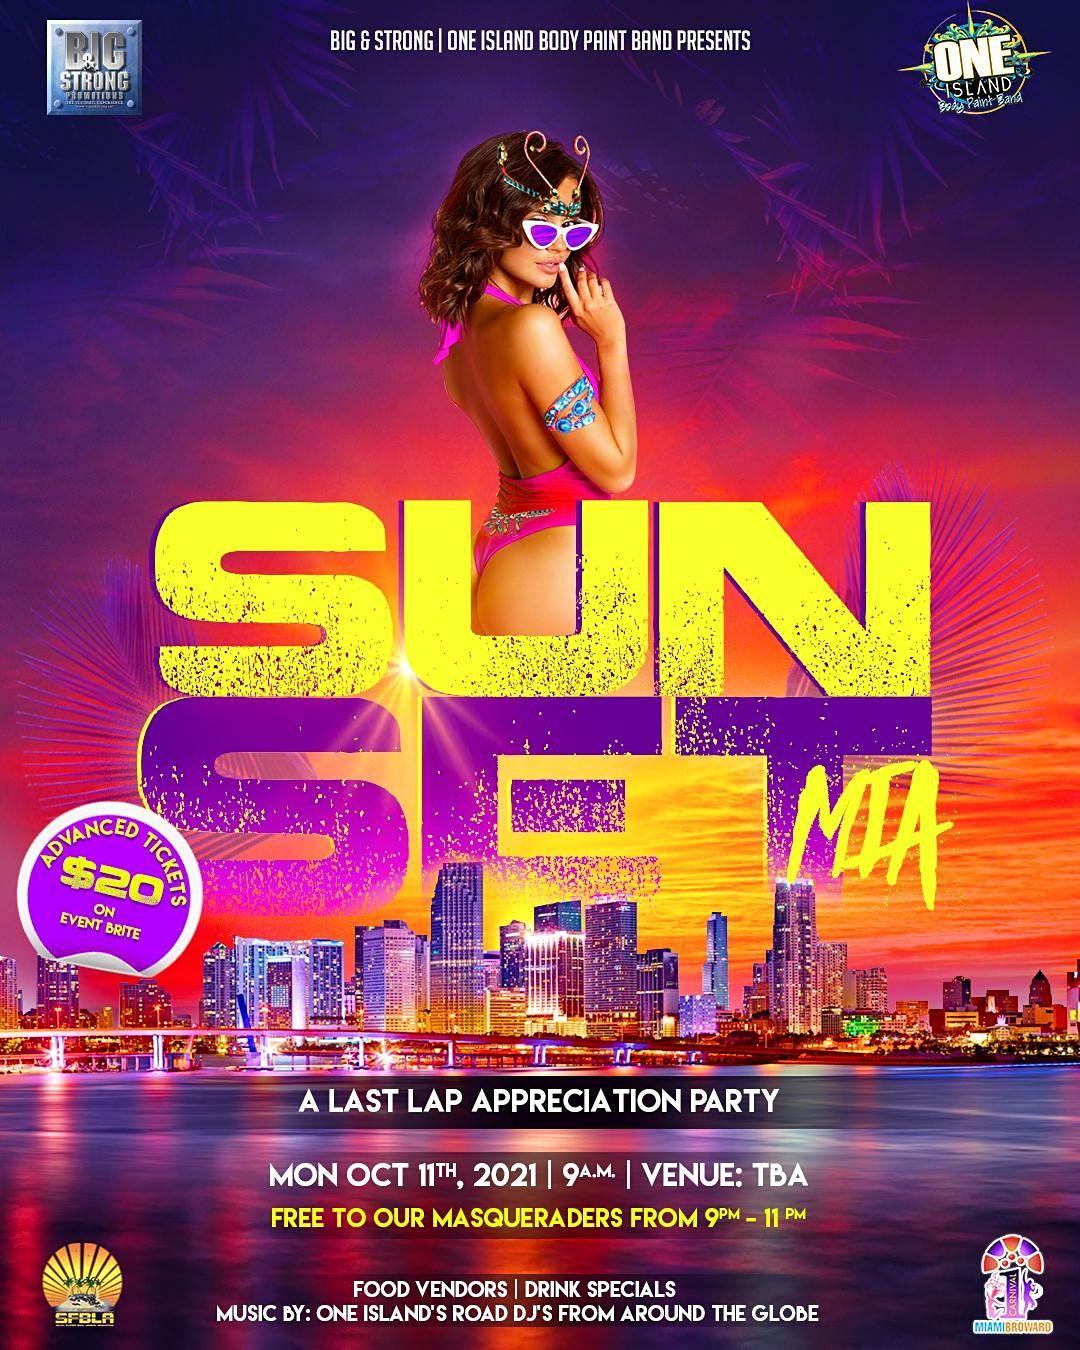 Sunset Mia 2021: A Last Lap Appreciation  Party, 11 October | Event in Miami | AllEvents.in